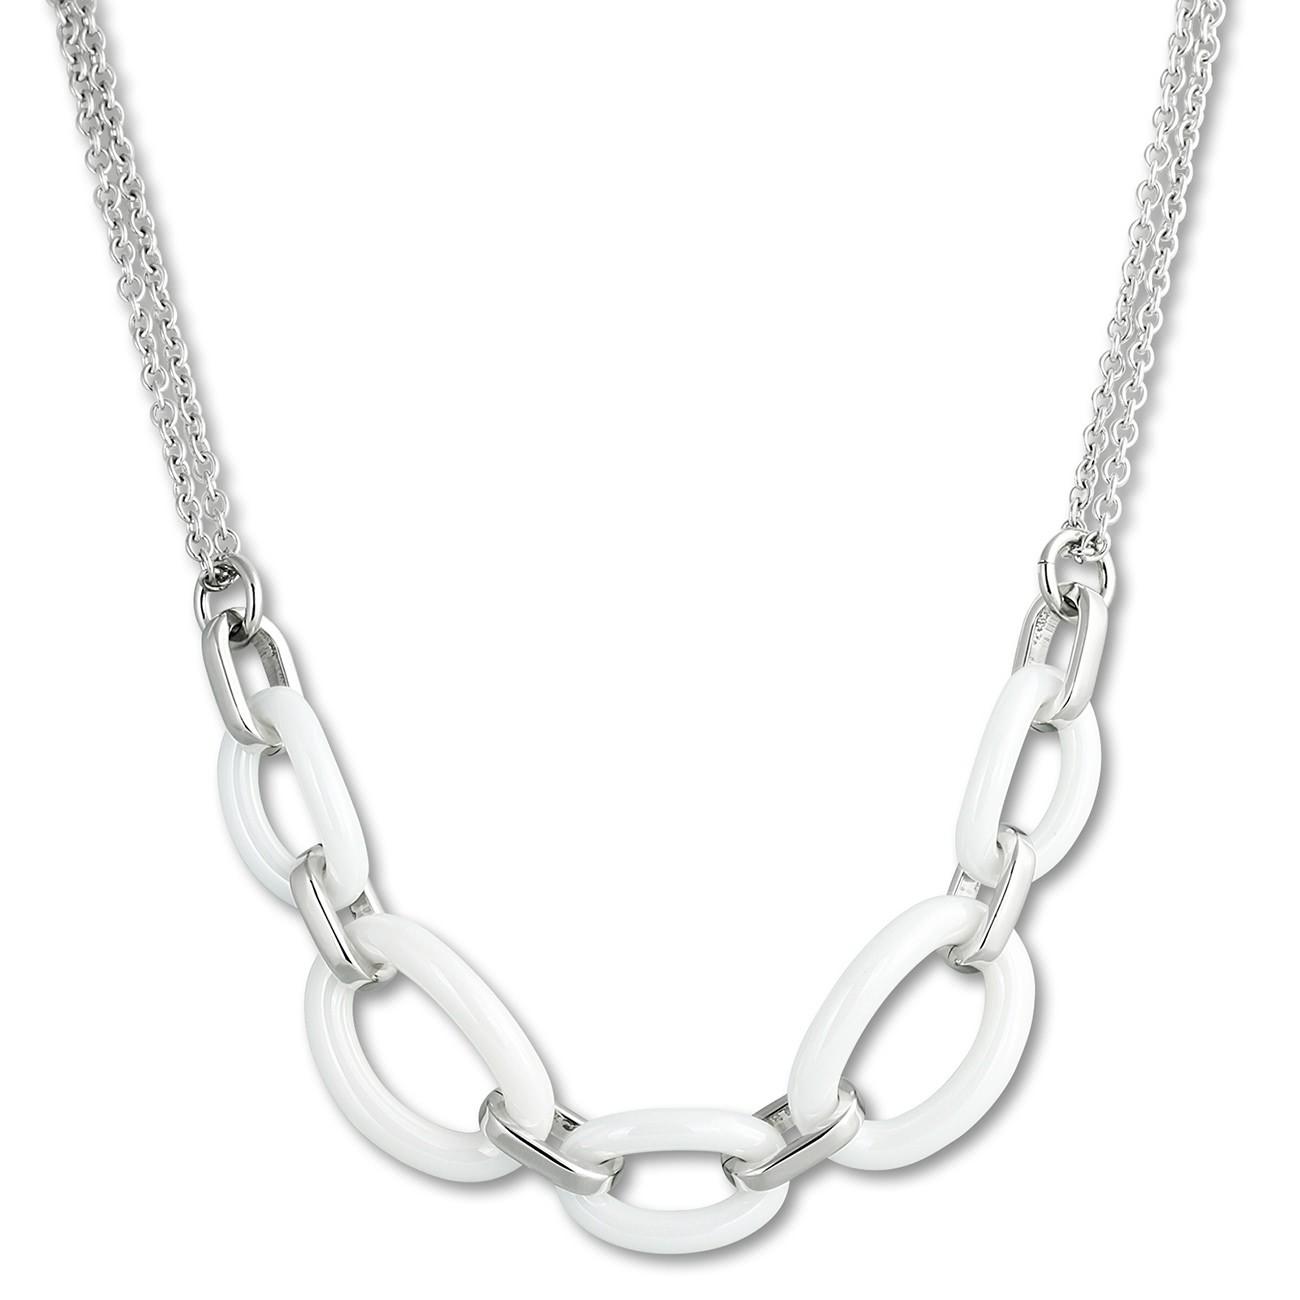 Amello Halskette Keramik Ovale weiß Damen Edelstahlschmuck ESKX16W